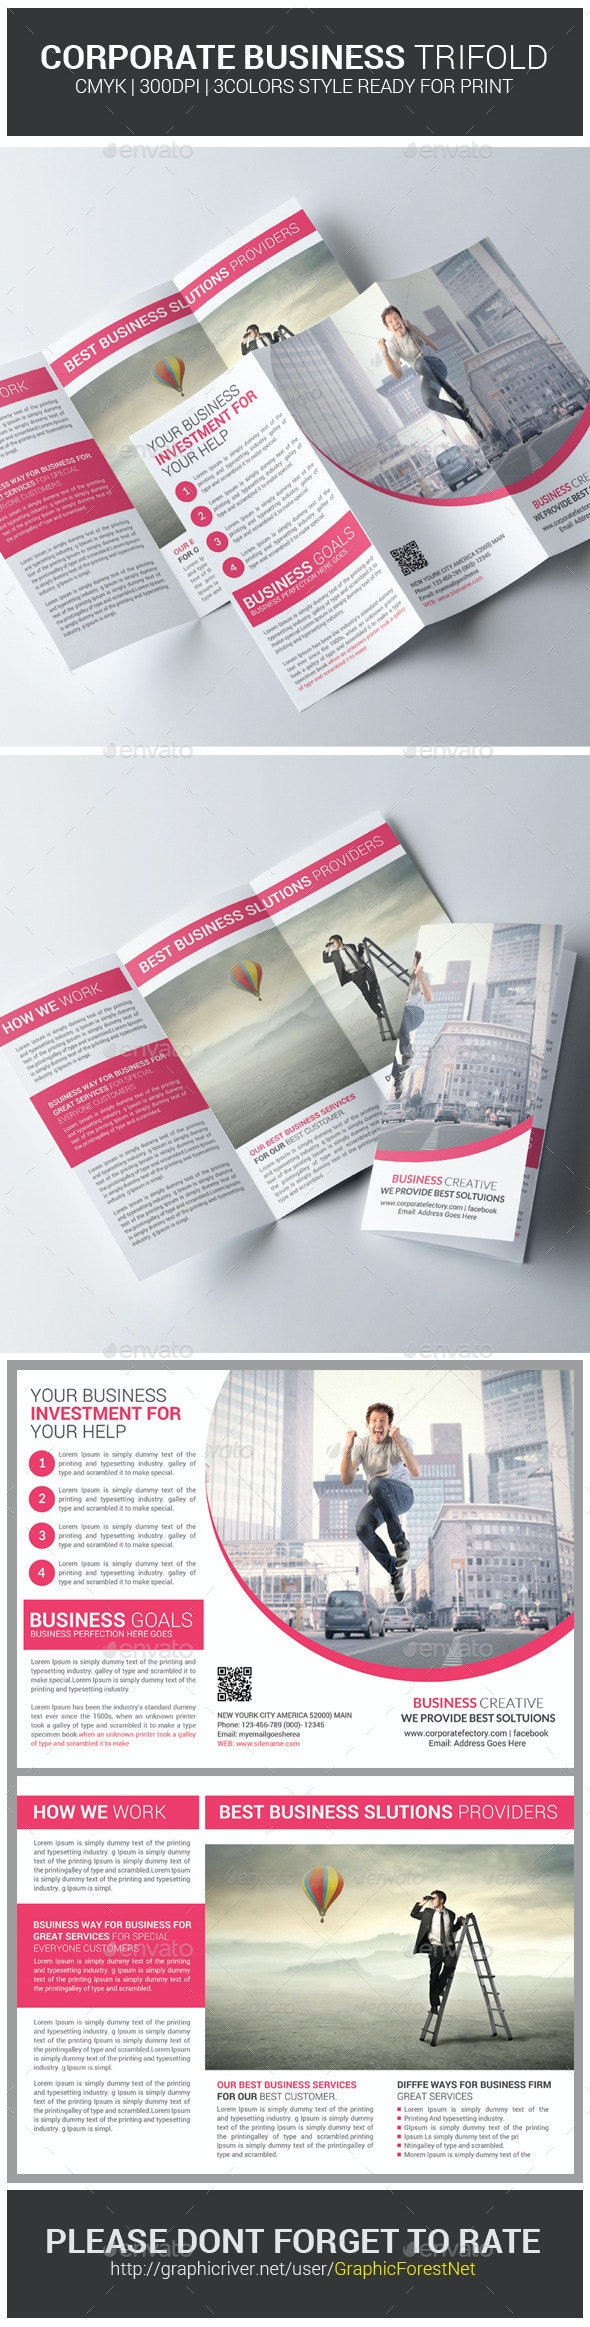 Corporate Business Trifold  Brochure Psd Templates - Corporate Brochures